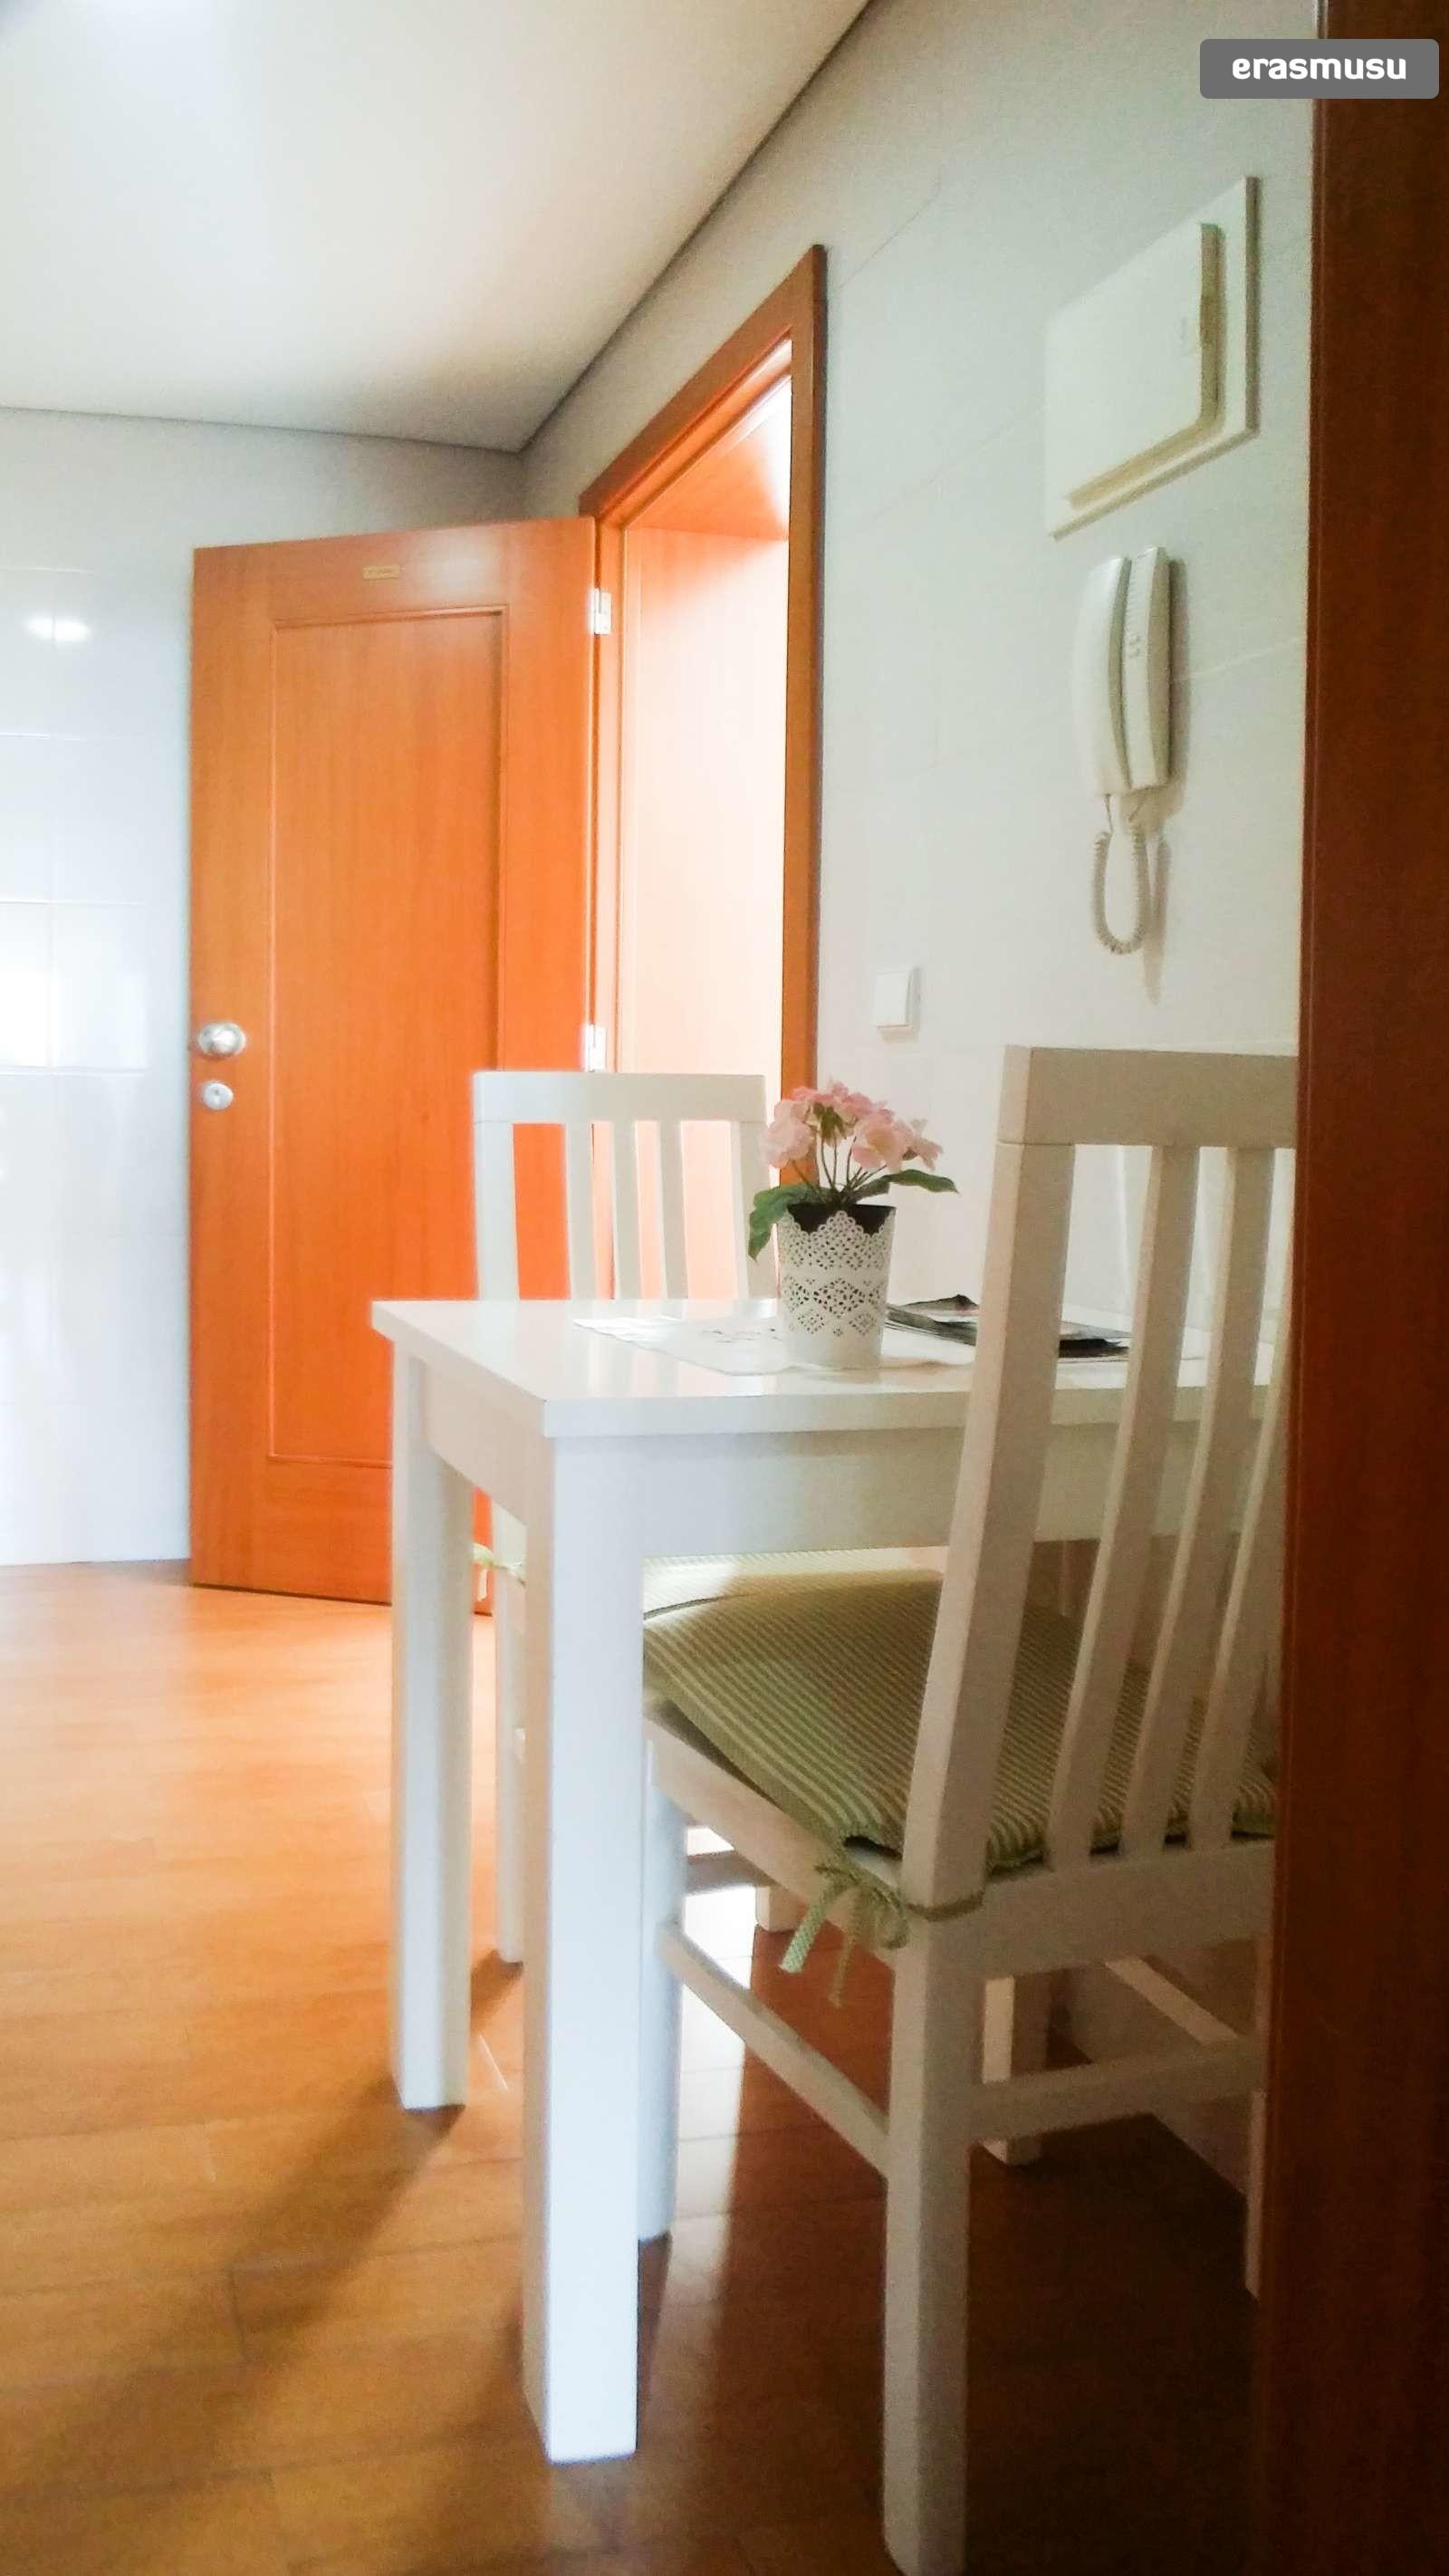 bright-studio-apartment-rent-cedofeita-b2e14a8fd90846d29f1820603